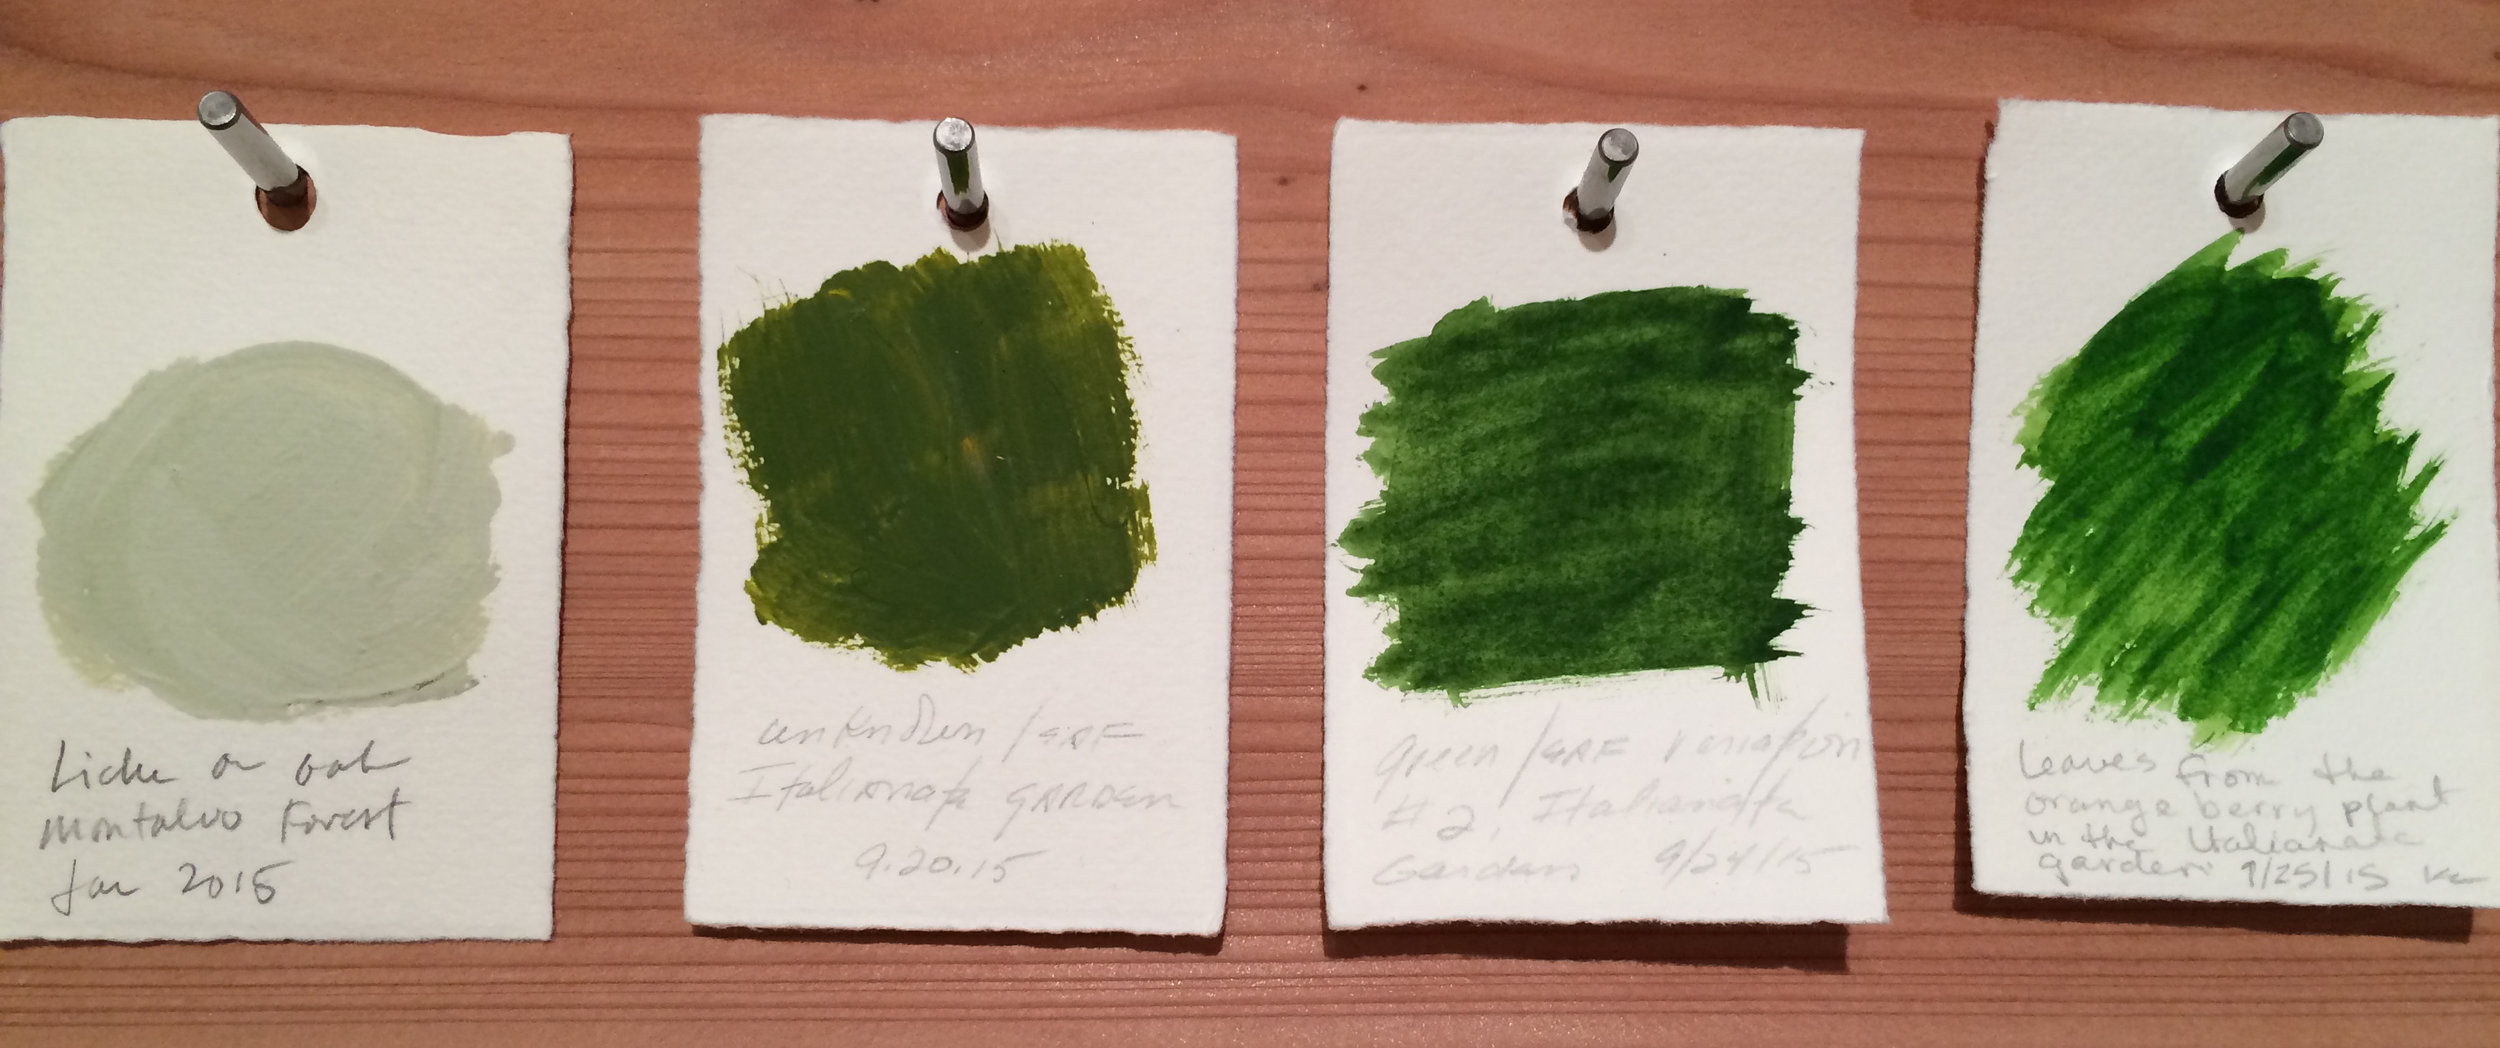 samples colorfiled.jpg